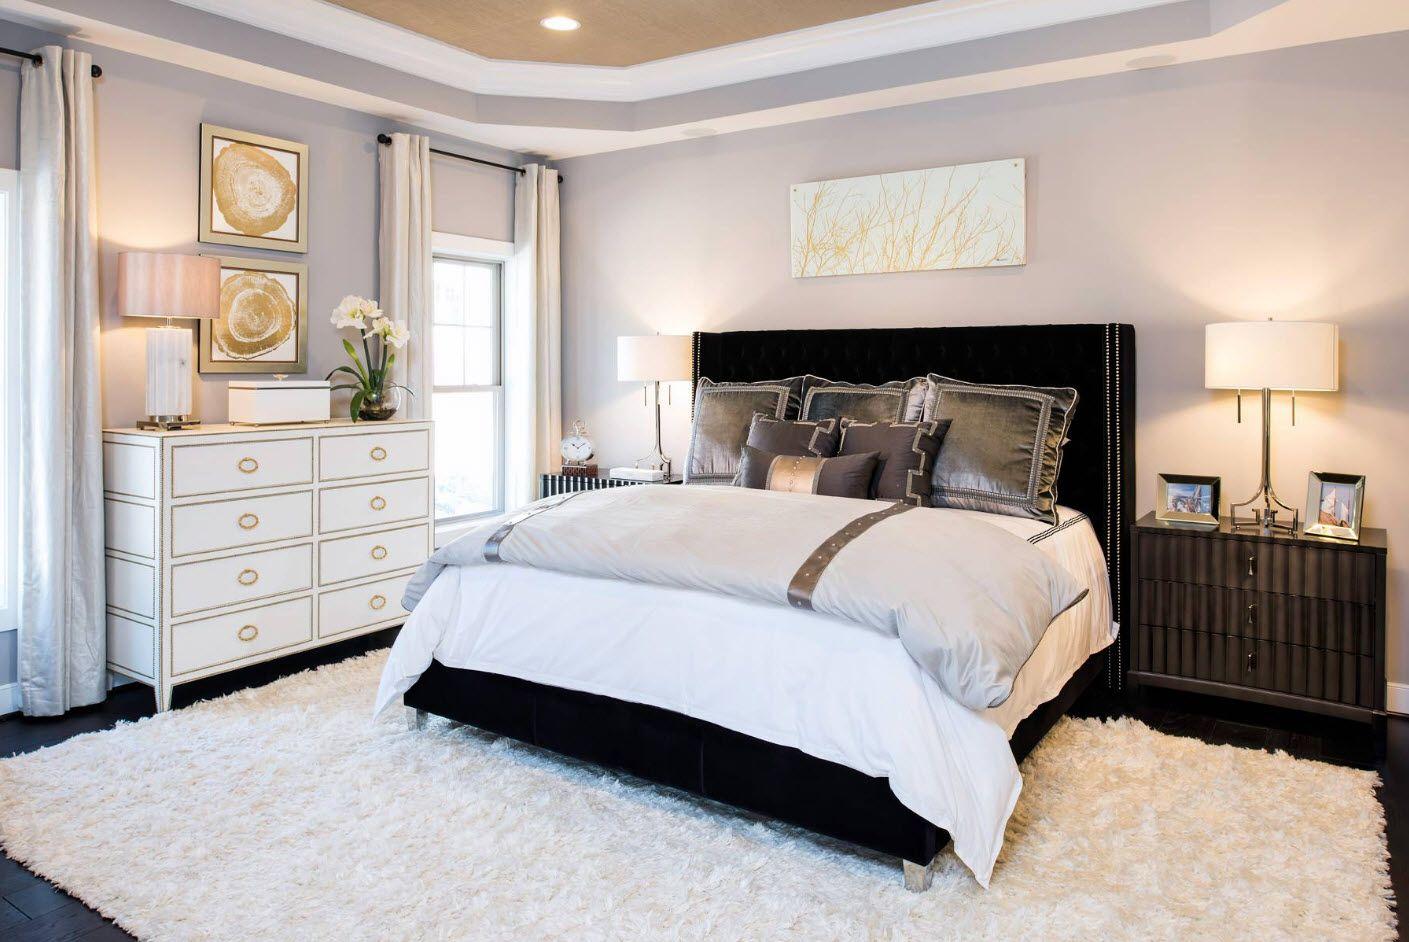 Contemporary interior of the bedroom